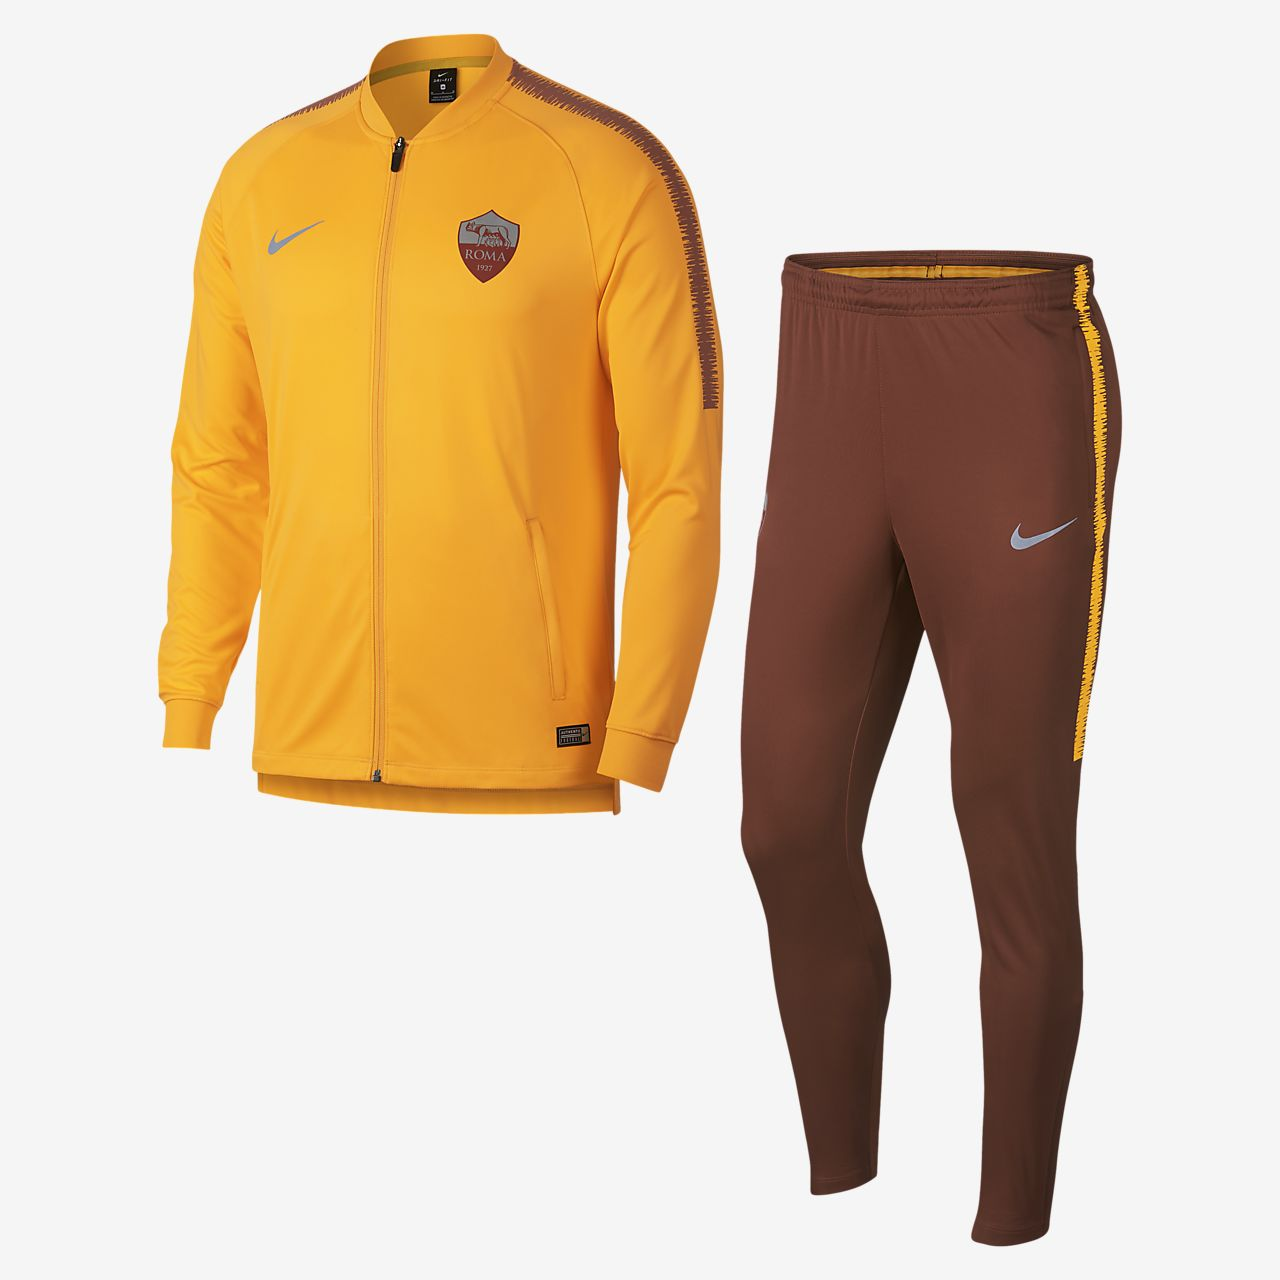 A.S. Roma Dri-FIT Squad Chándal de fútbol - Hombre. Nike.com ES 2e7260b0fe471